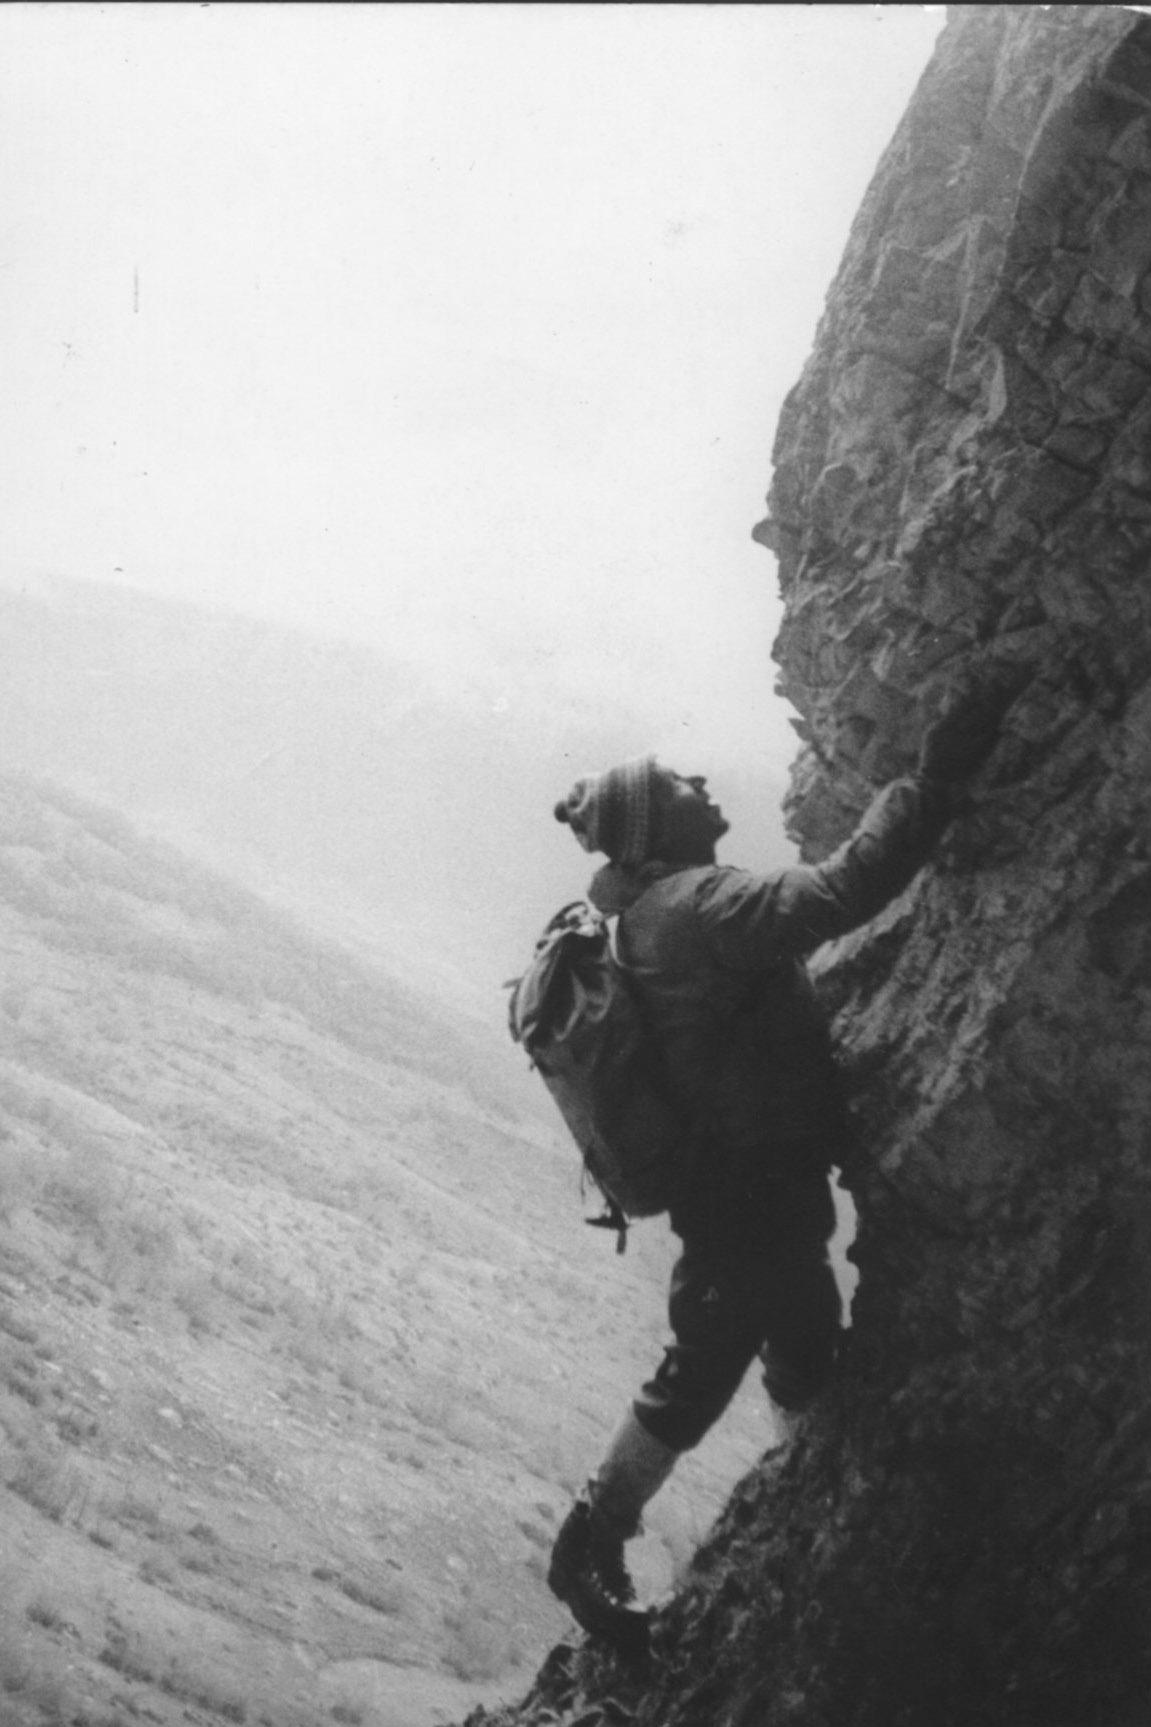 Una via per l'alpinista abruzzese Gigi Panei